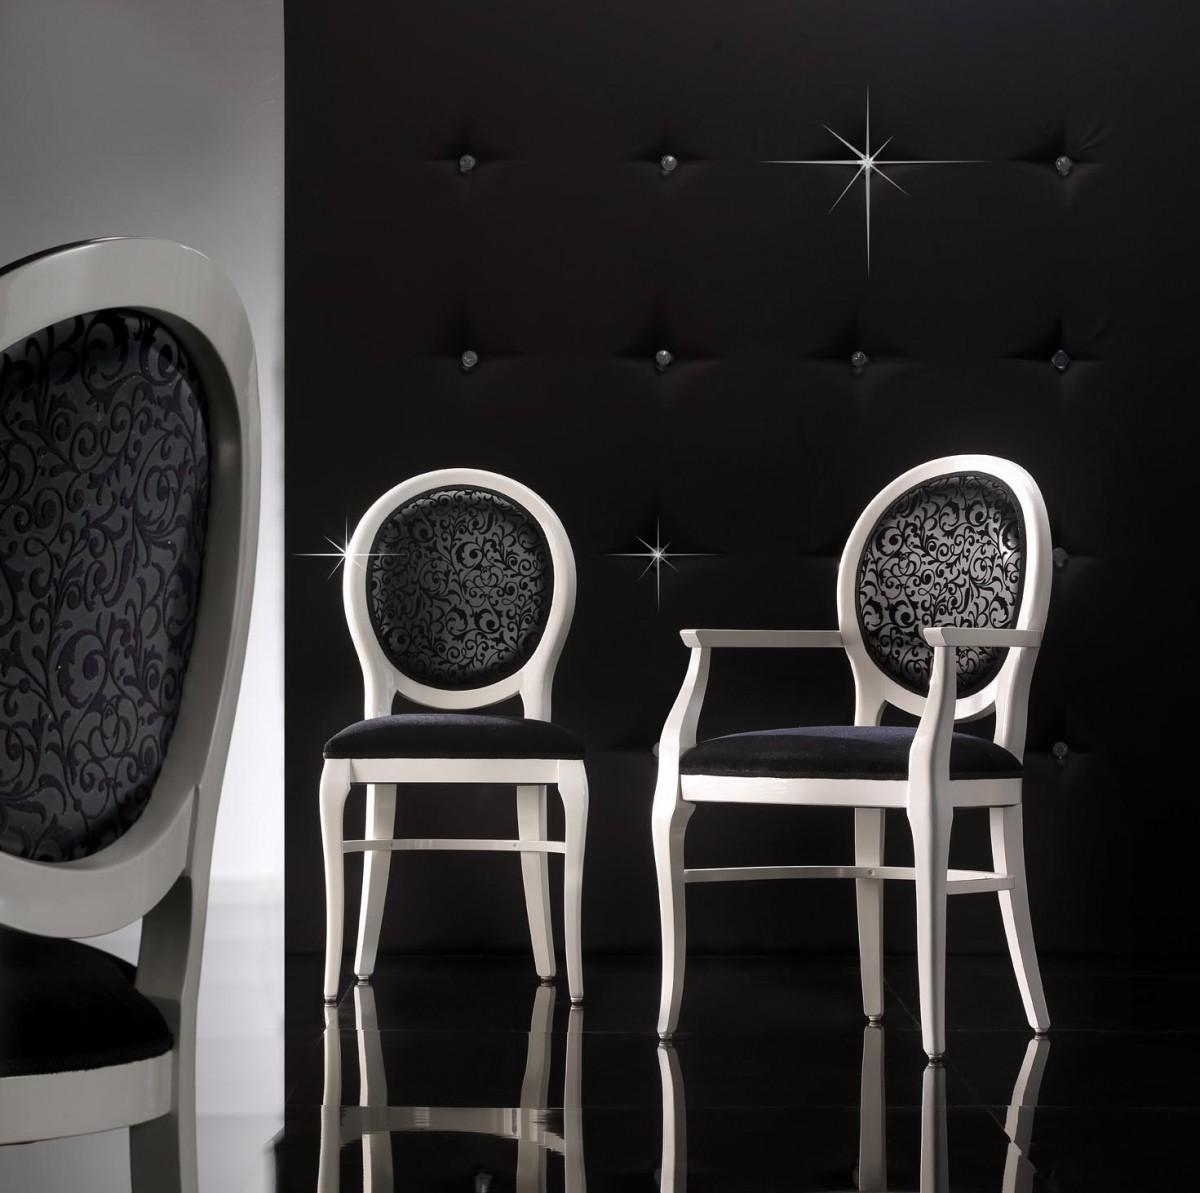 Catherine s restaurant meubilair p m furniture horeca for Design stuhl leisure